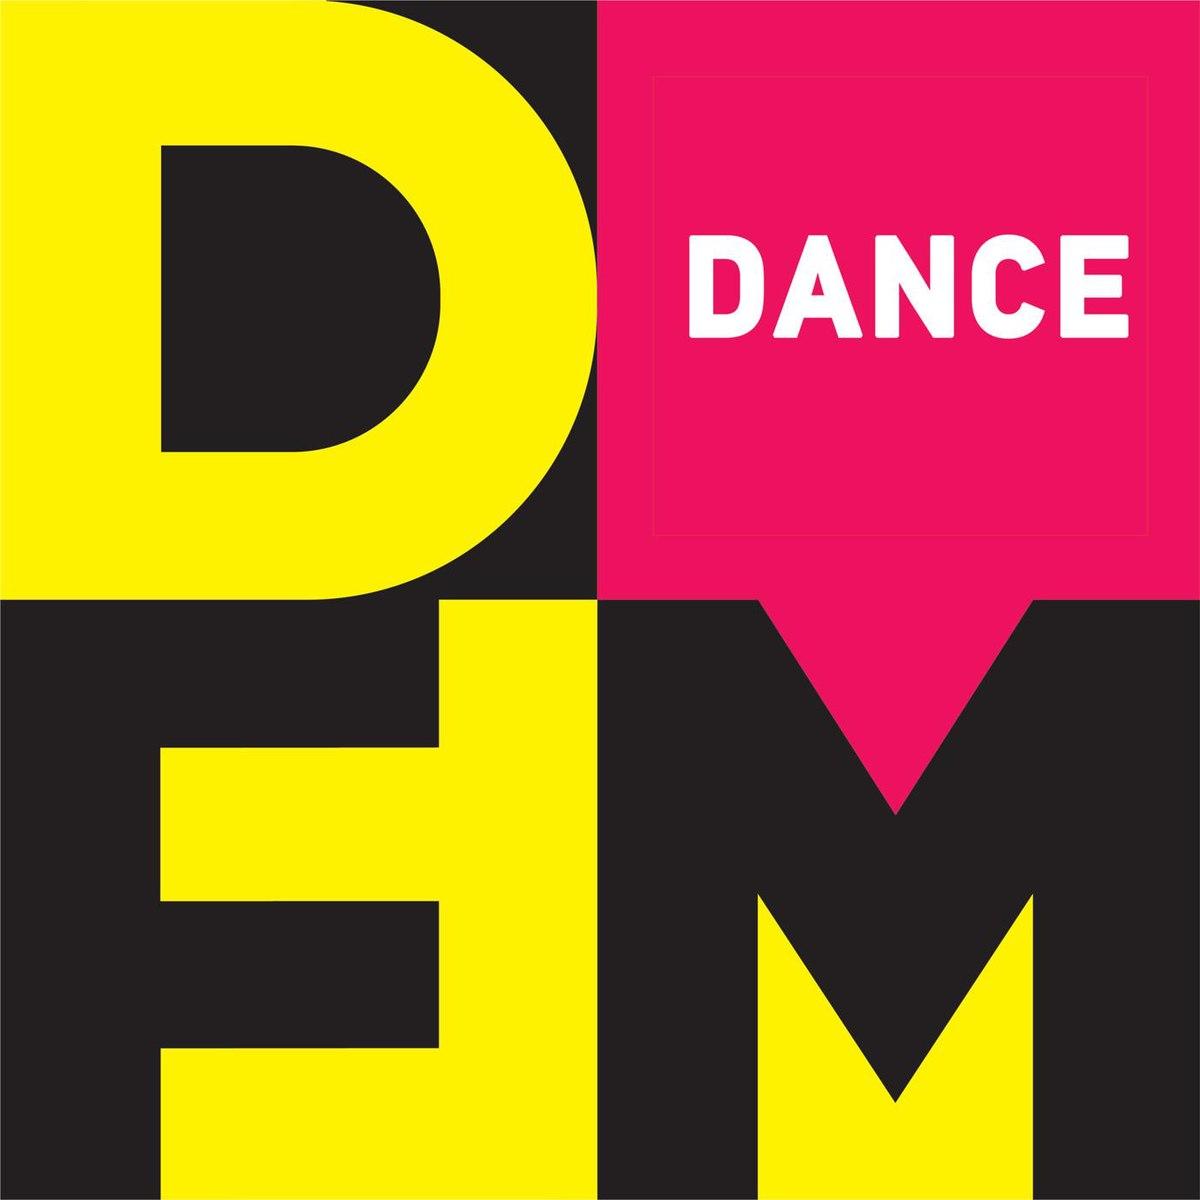 Новинки dfm russian dance скачать